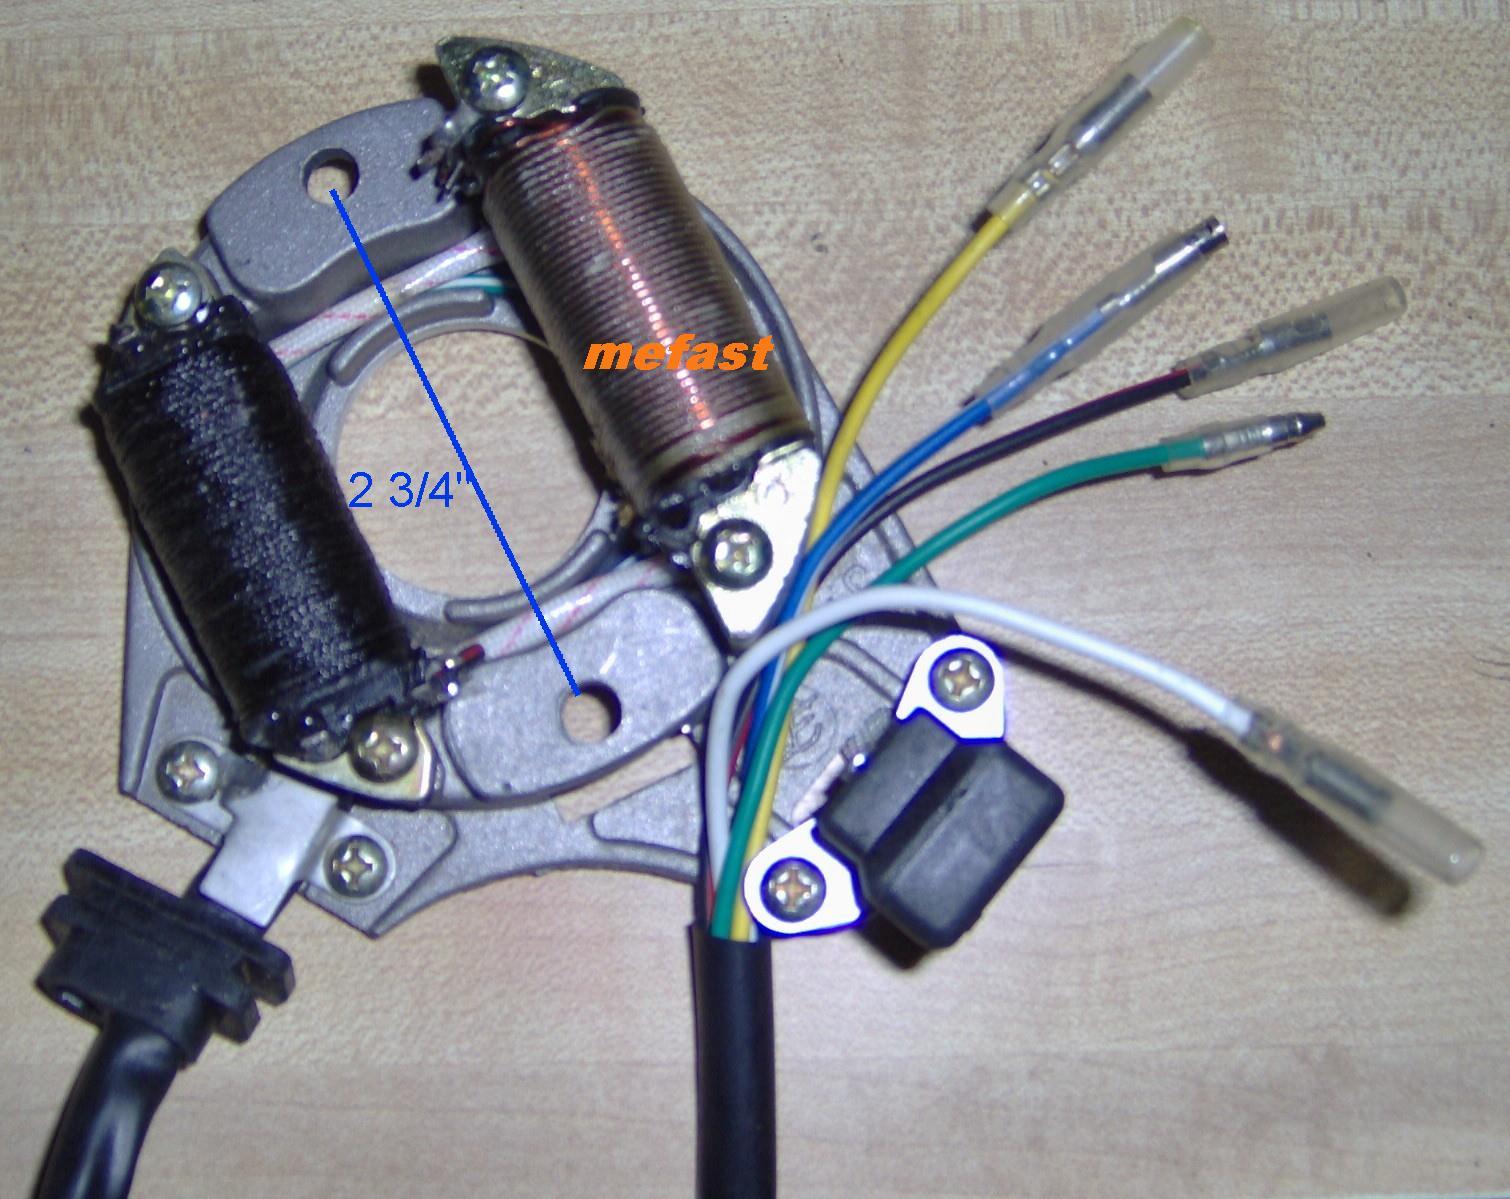 hight resolution of t2 magneto taotao t2 110cc stator 5 wire 5 wire stator wiring diagram 110cc stator wiring 4